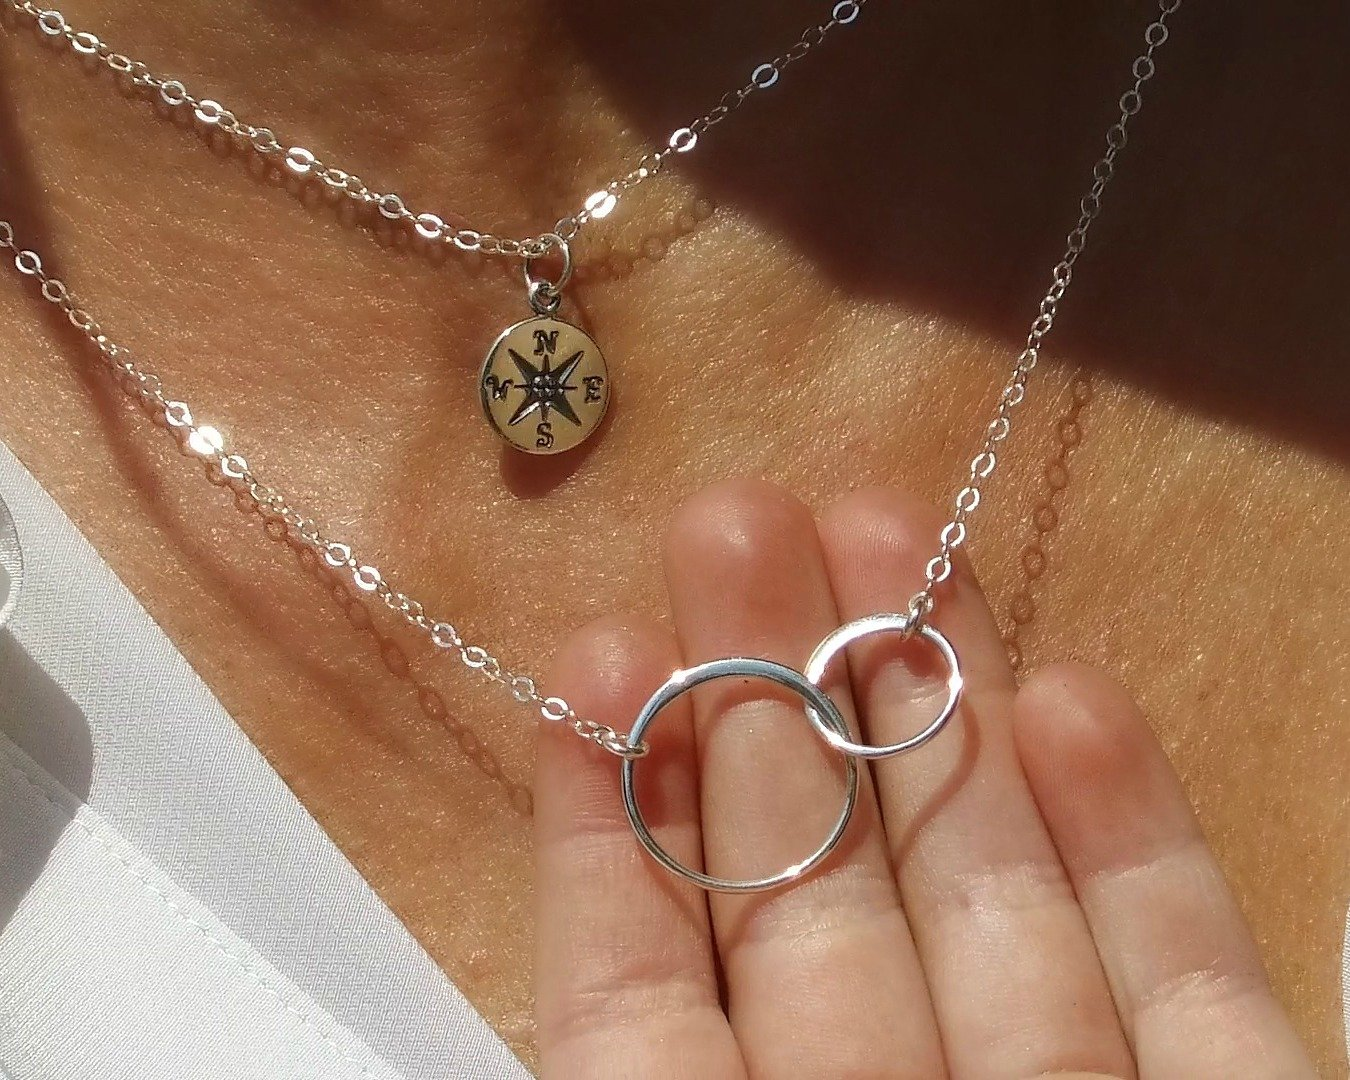 EFYTAL Godmother Gifts from Godchild Sterling Silver Interlocking Circle Necklace Proposal Gift for Girl Baptism by EFYTAL (Image #4)